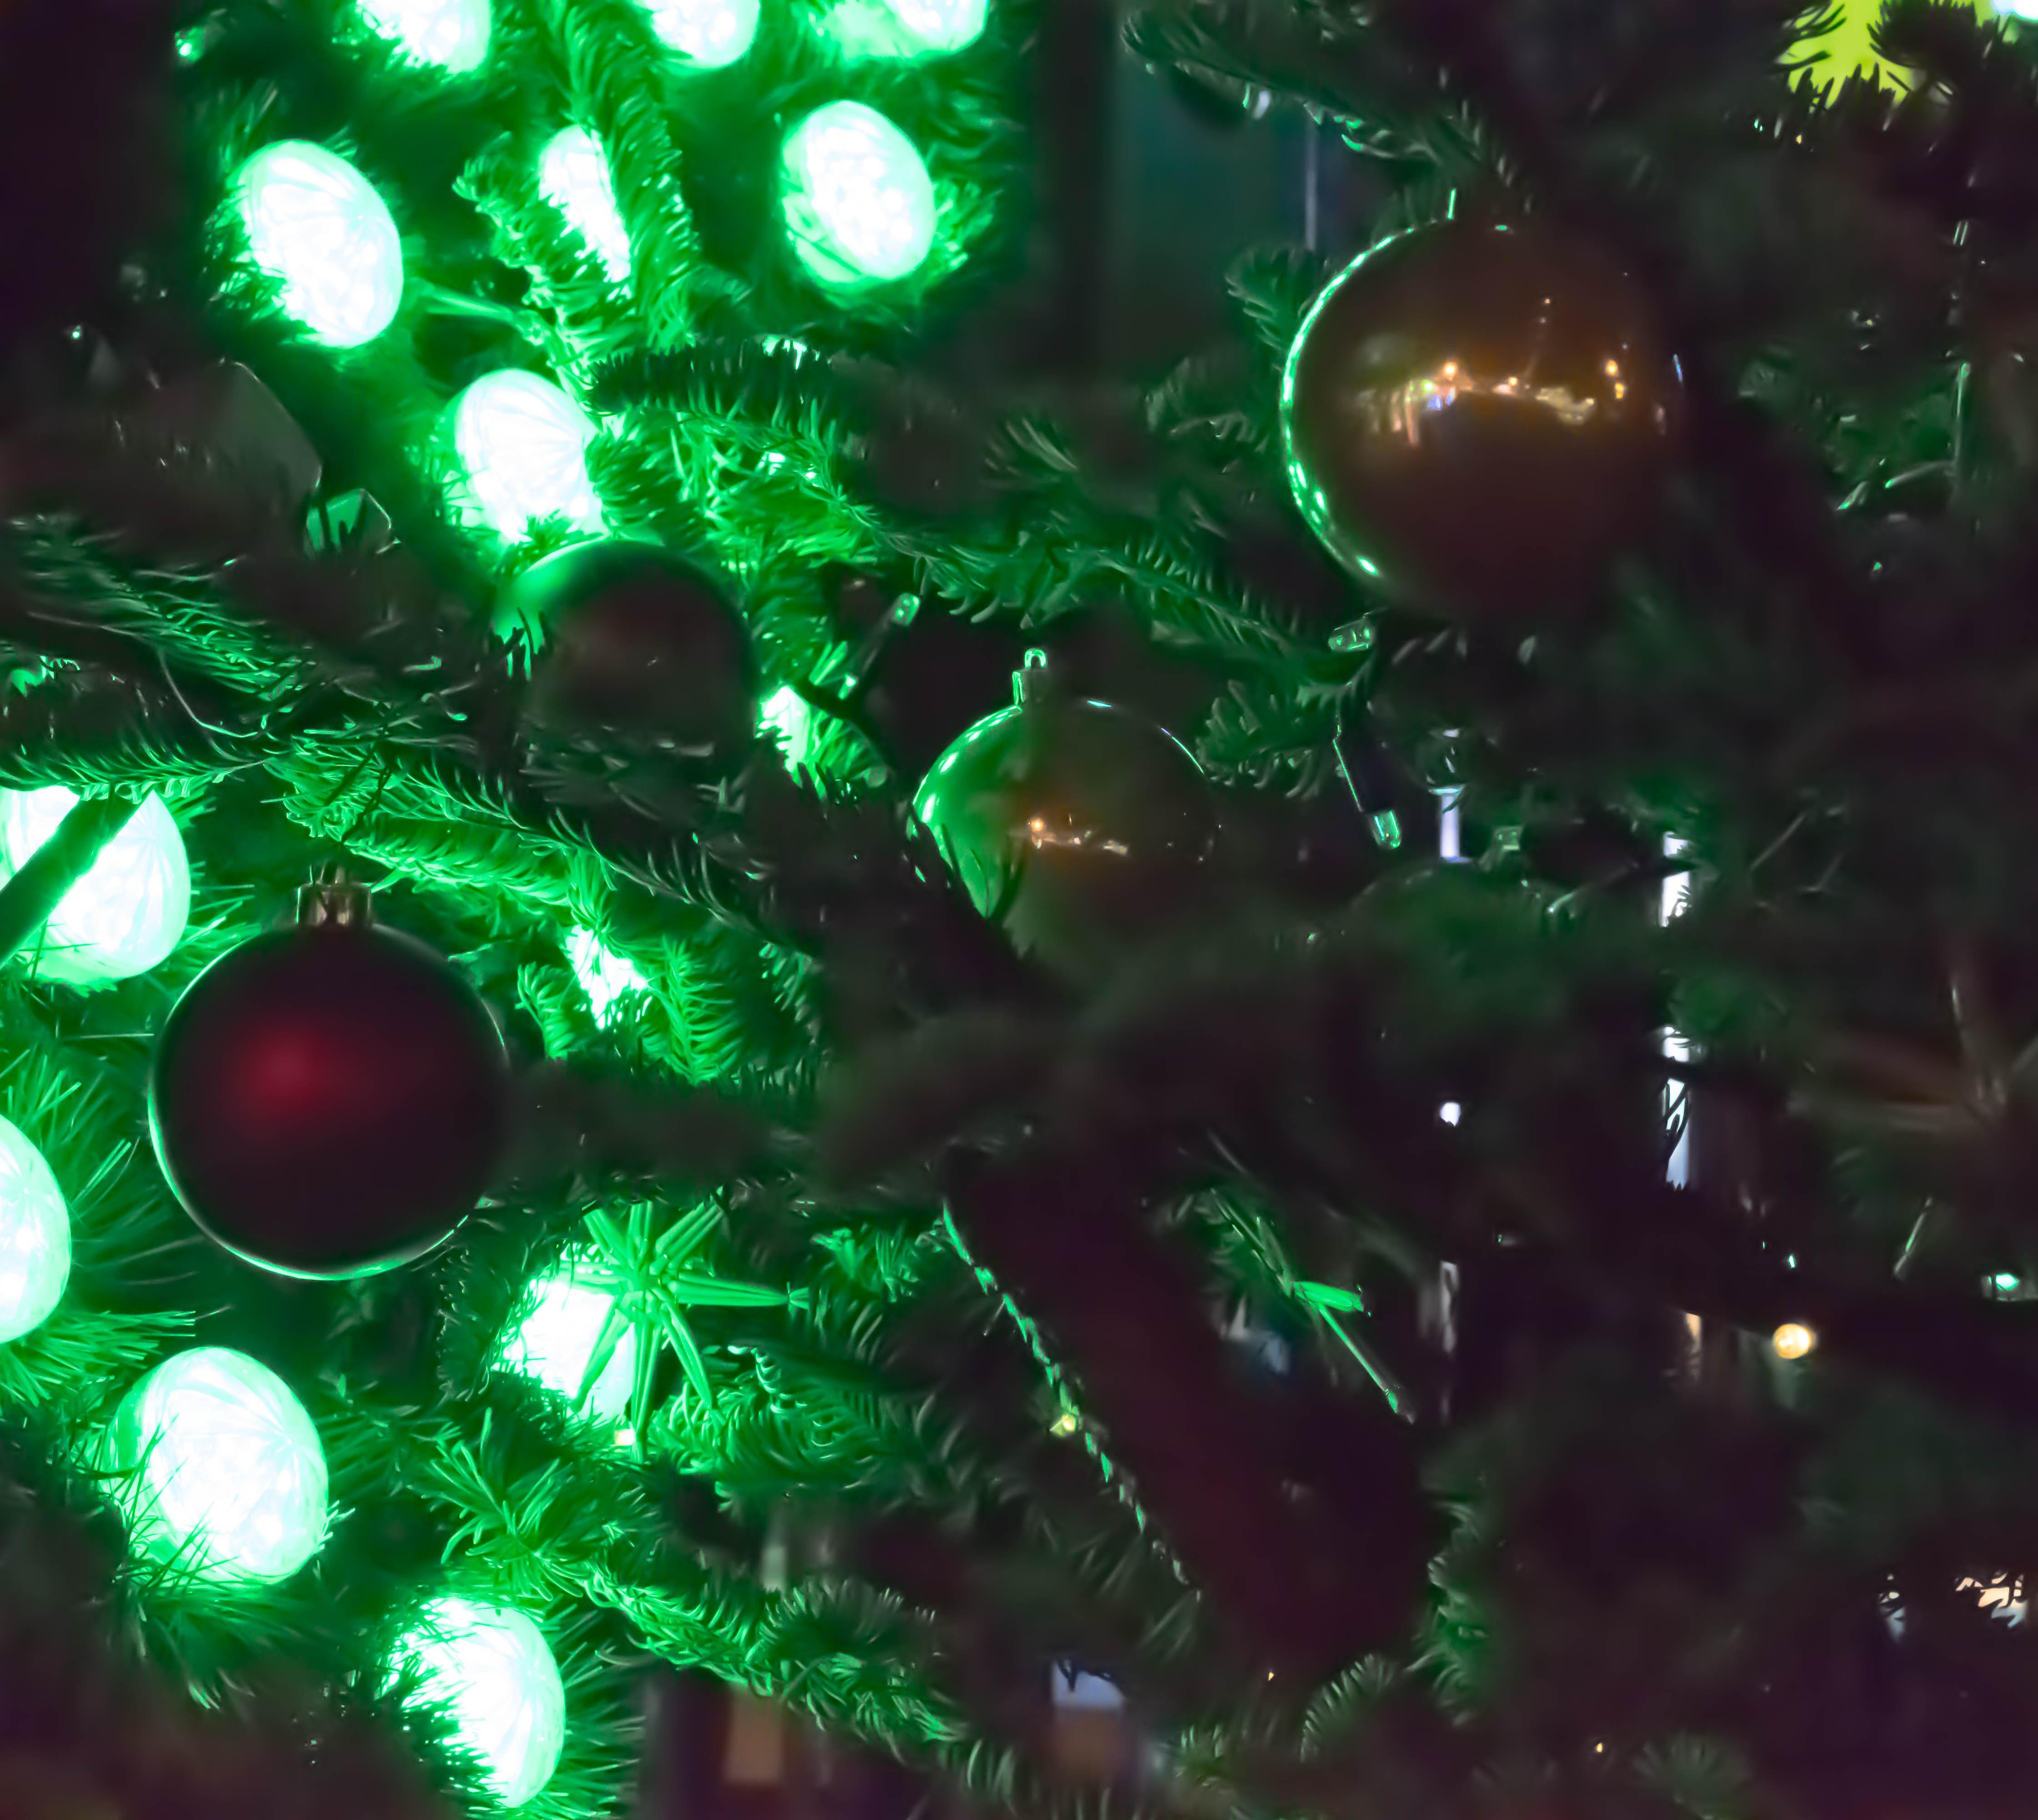 Christmas In Europe Wallpaper.Wallpaper Winter Branch Green Germany Christmas Tree